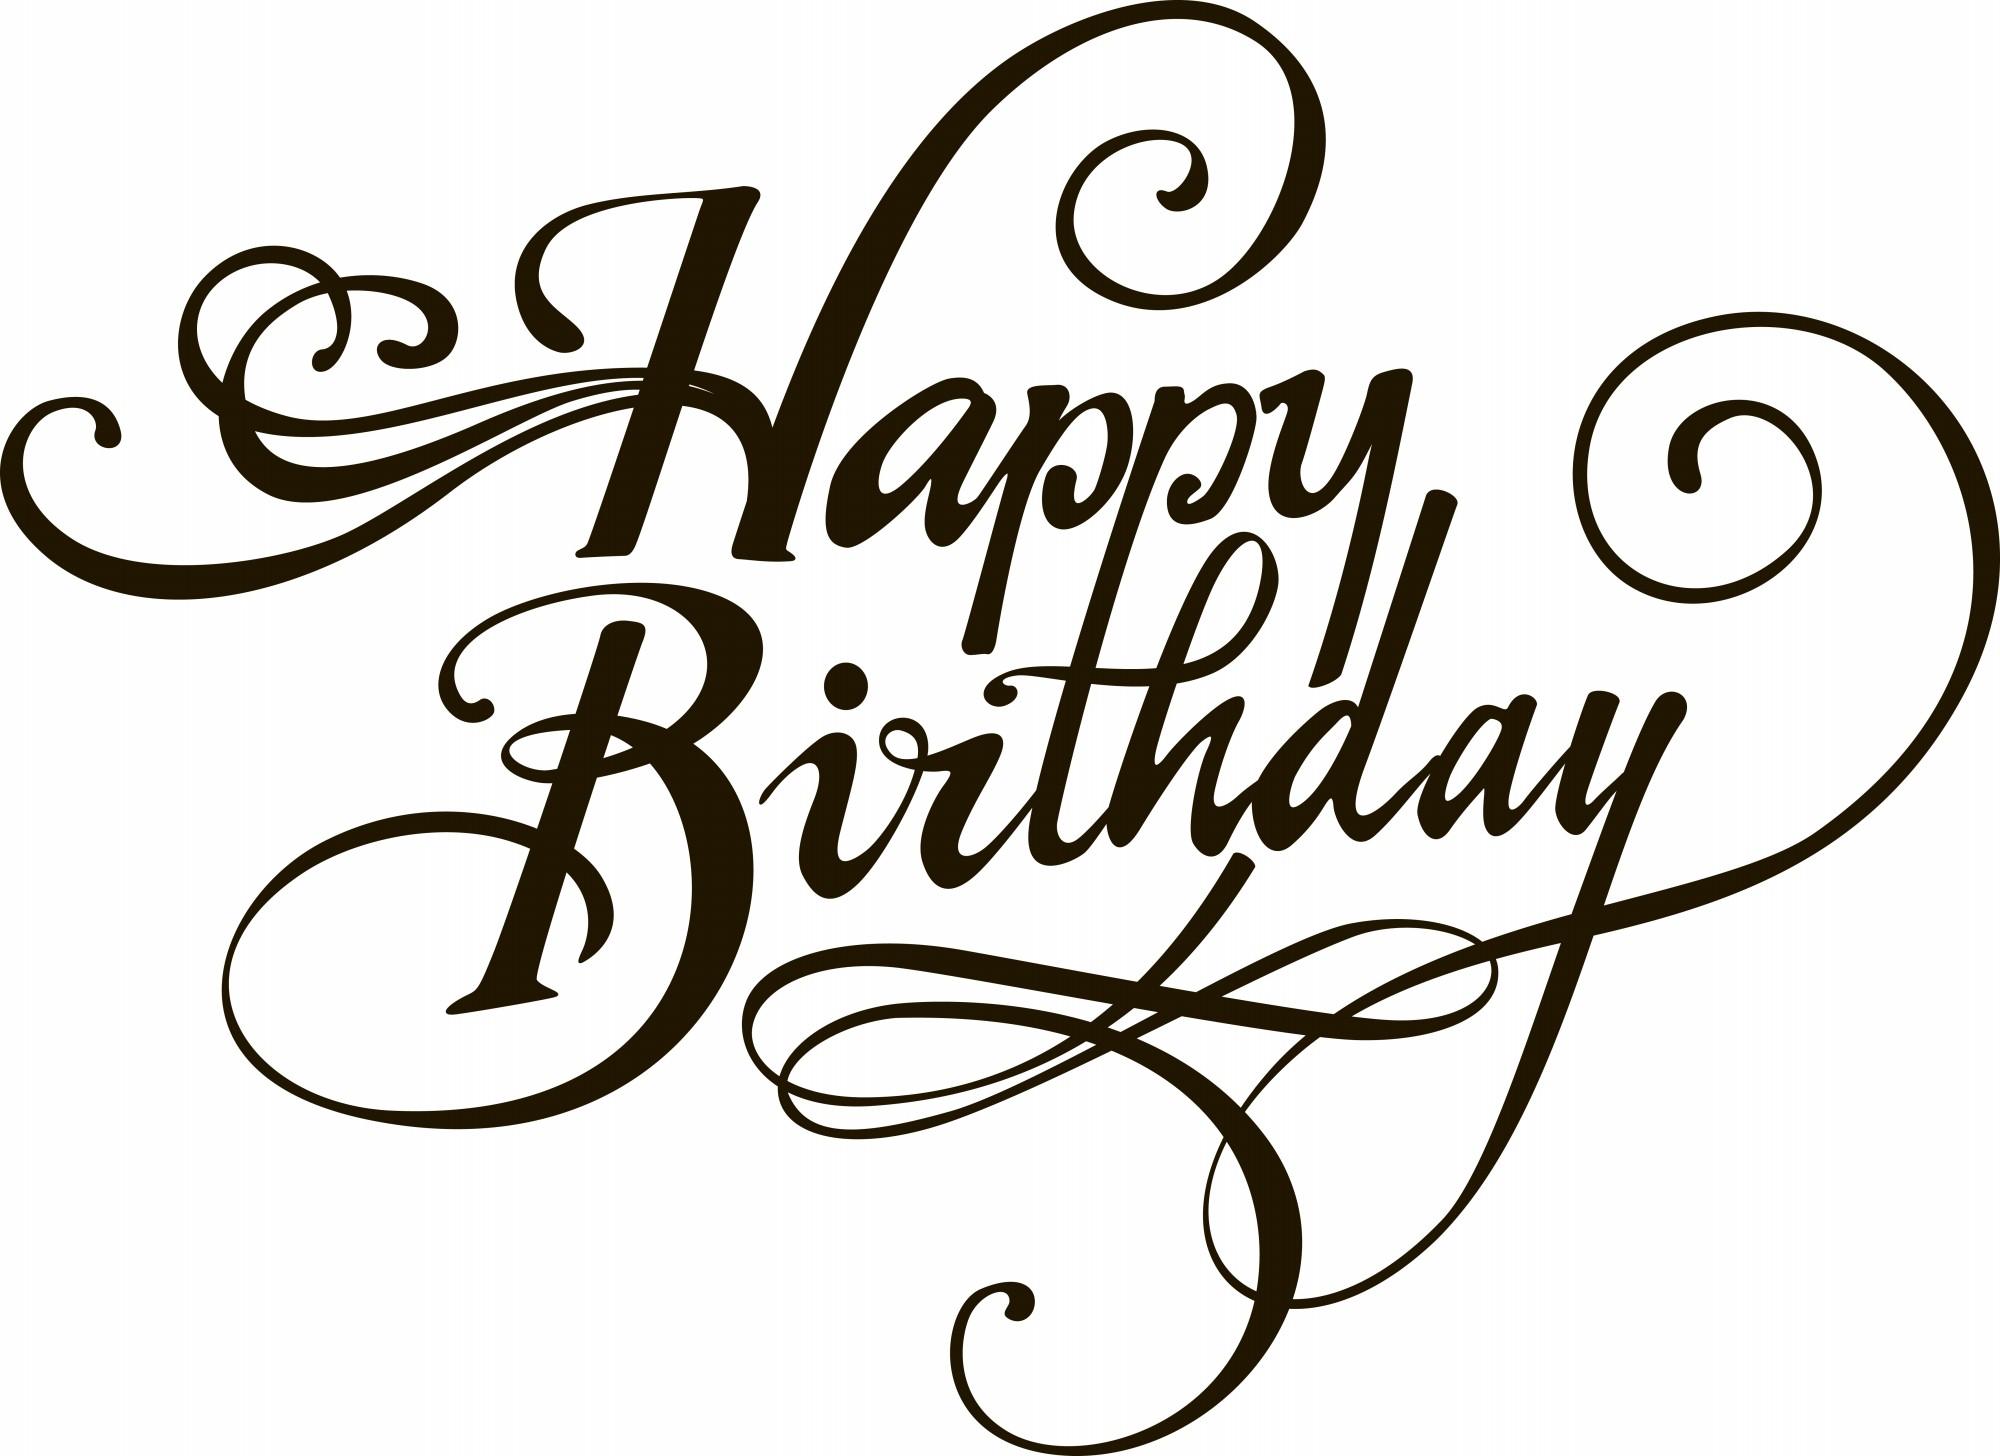 2000x1456 Birthday Card Drawing Ideas Happy Birthday Card Designs To Draw